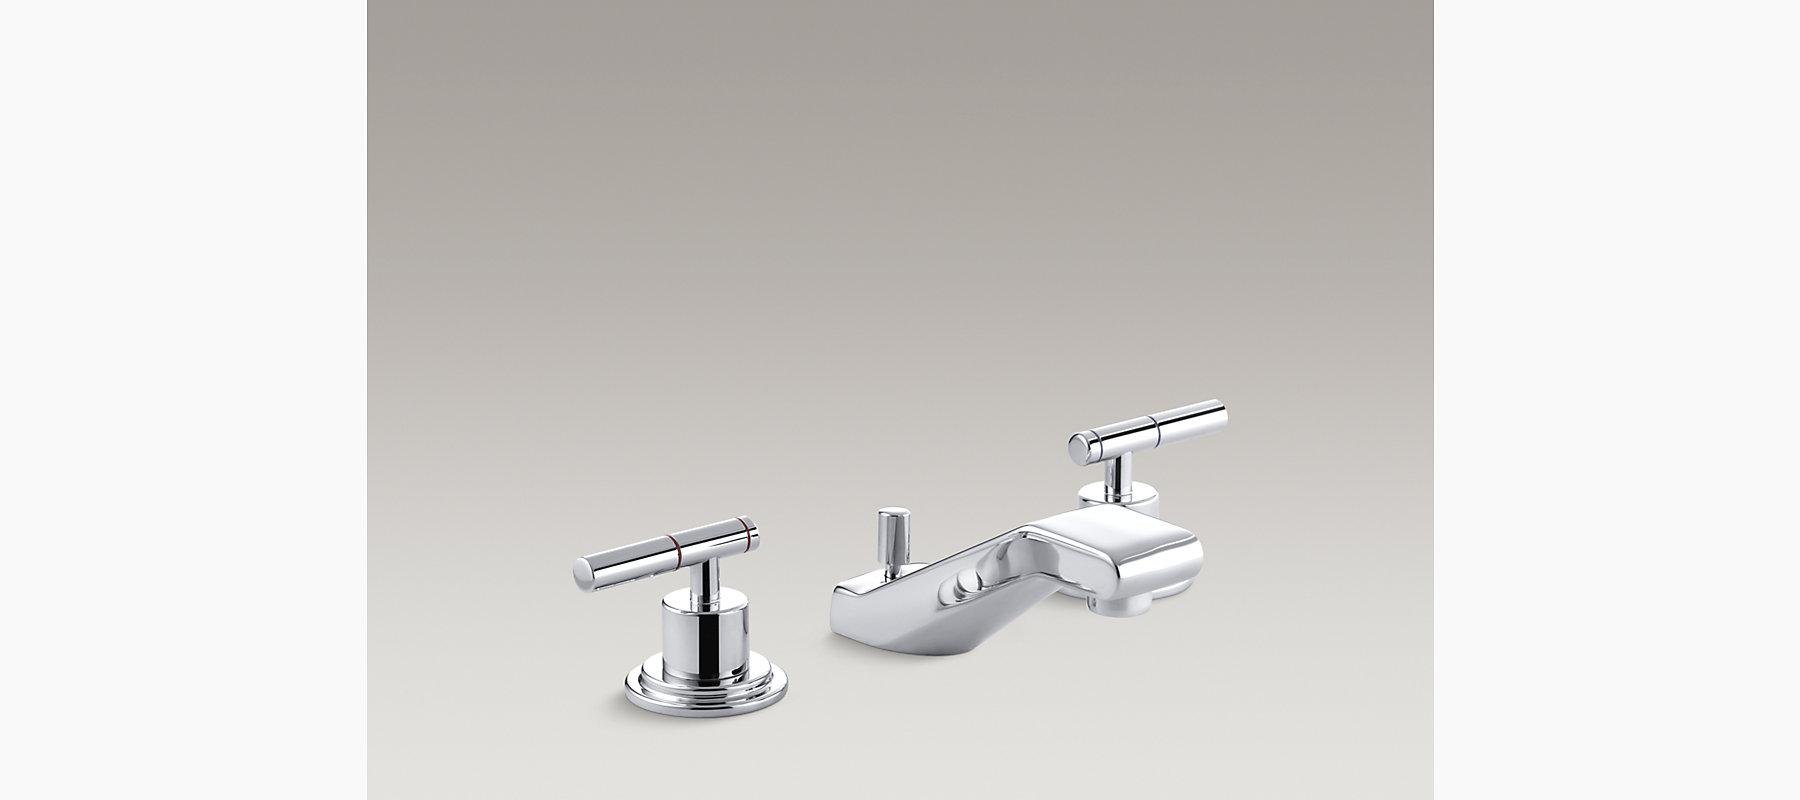 Kohler Elmbrook 8 In Widespread 2 Handle Bathroom Faucet: Taboret Widespread Sink Faucet With Lever Handles